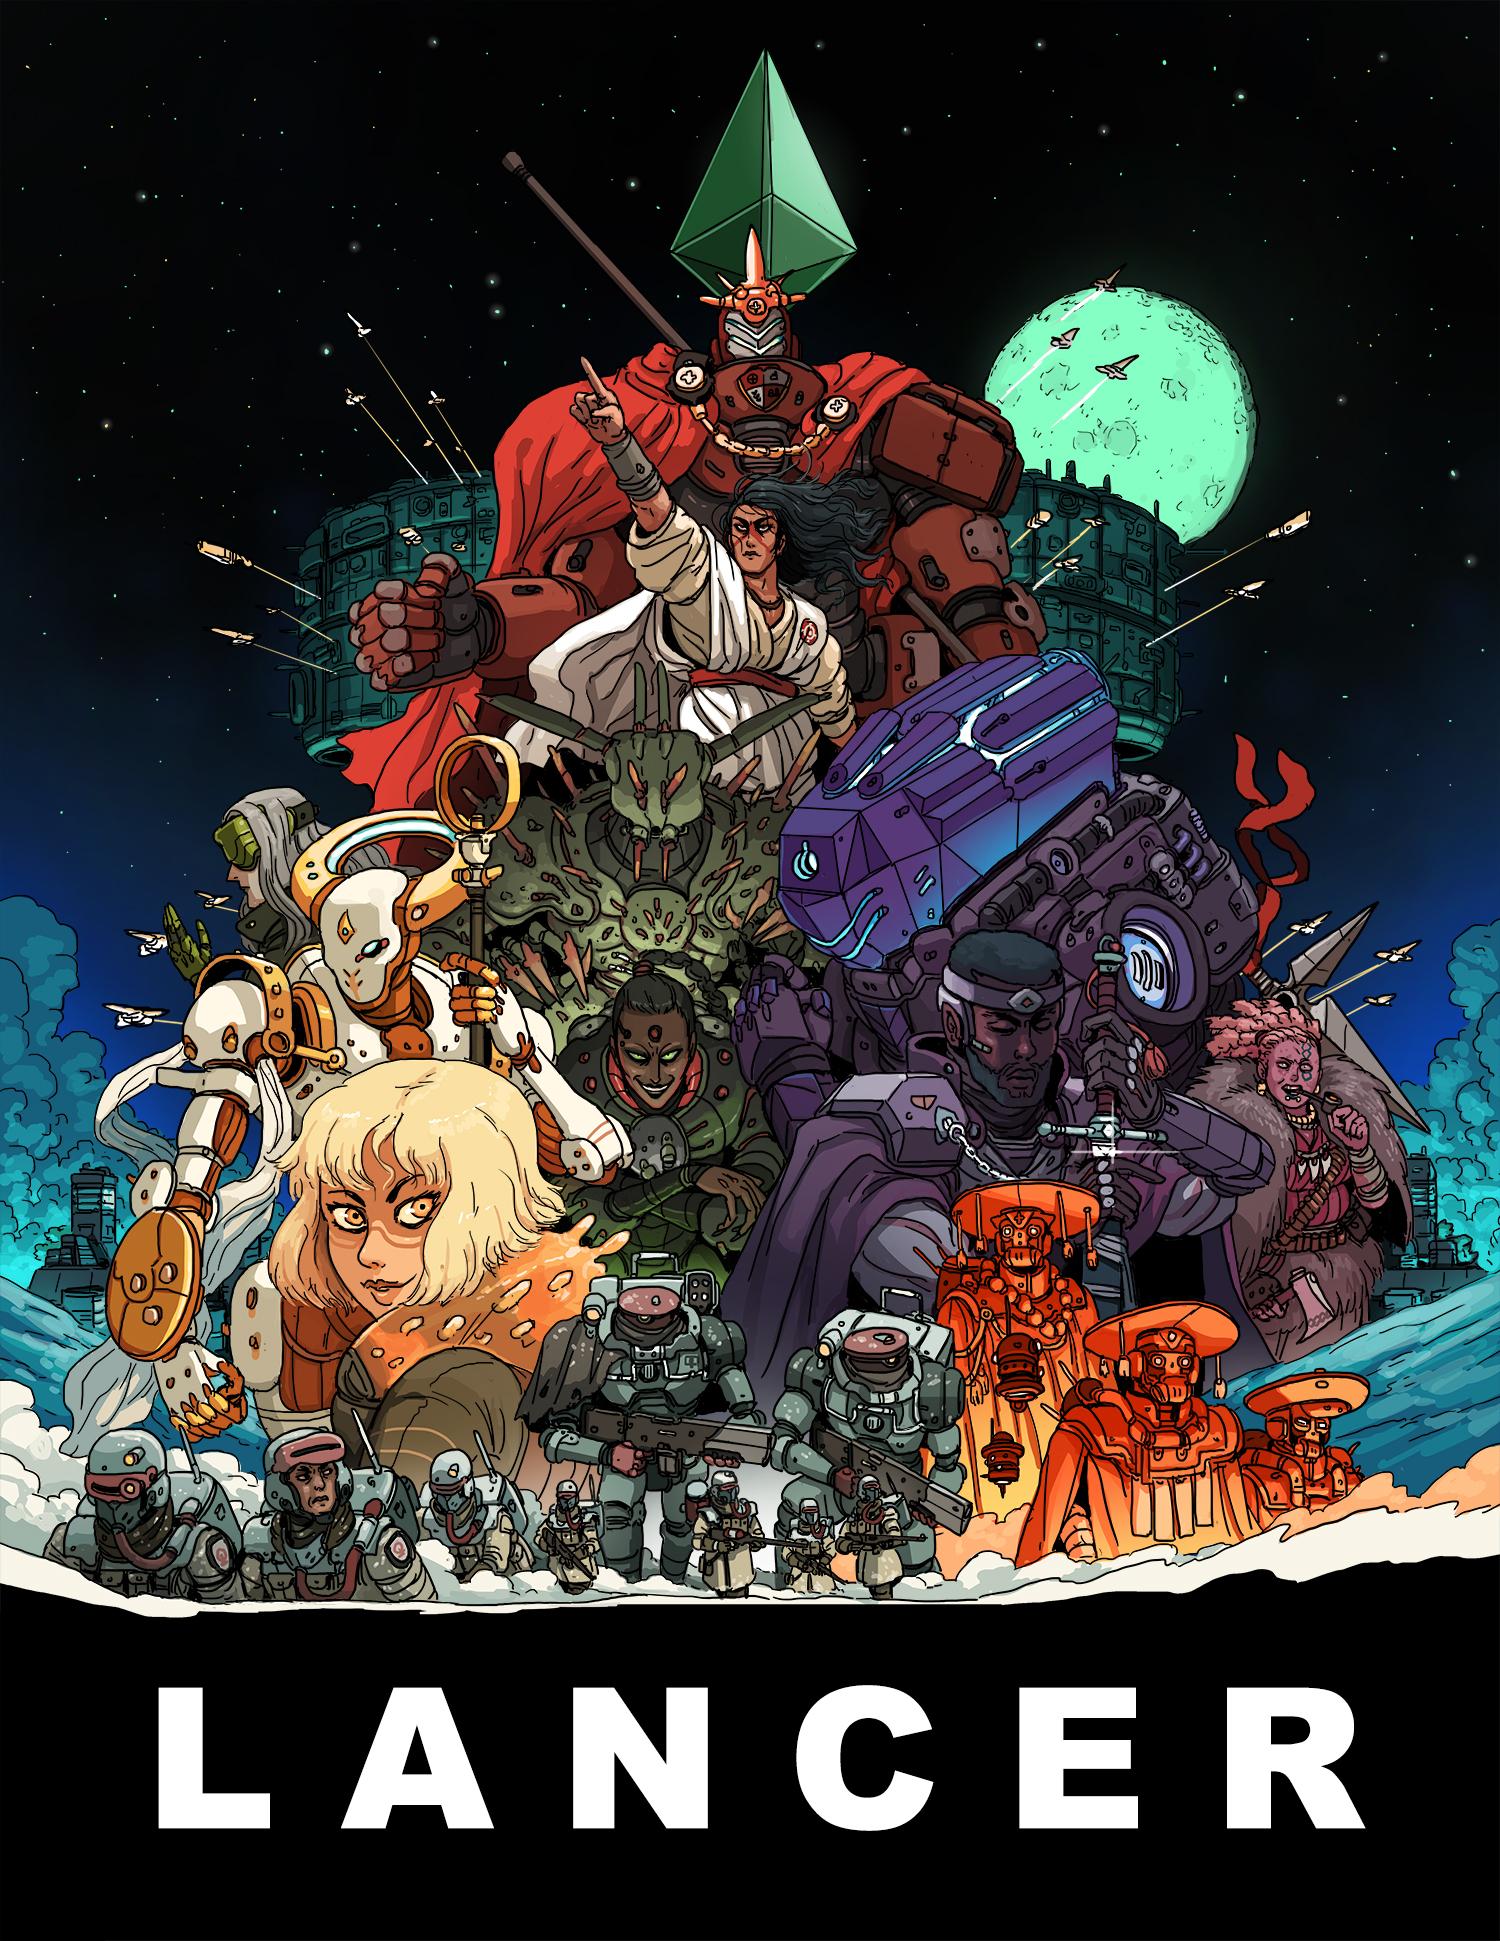 Lancer Core Book by Massif Press